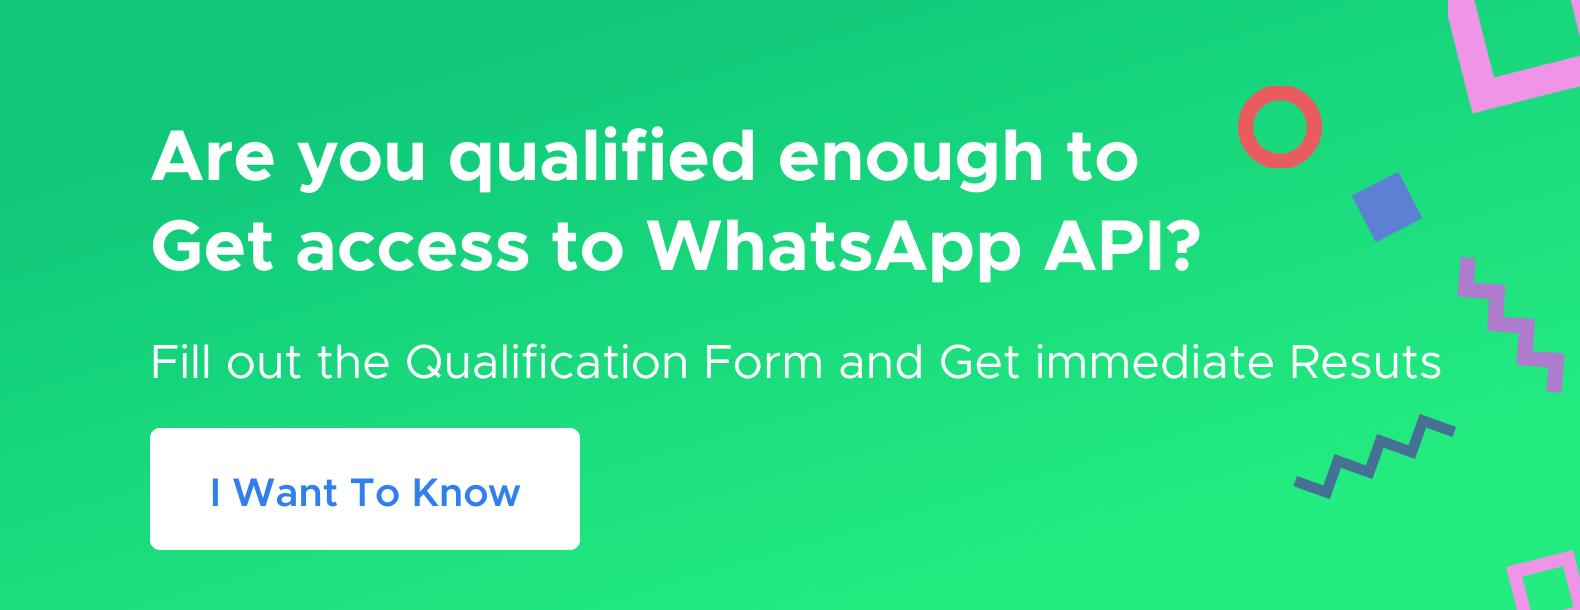 WhatsApp Chatbot Guide